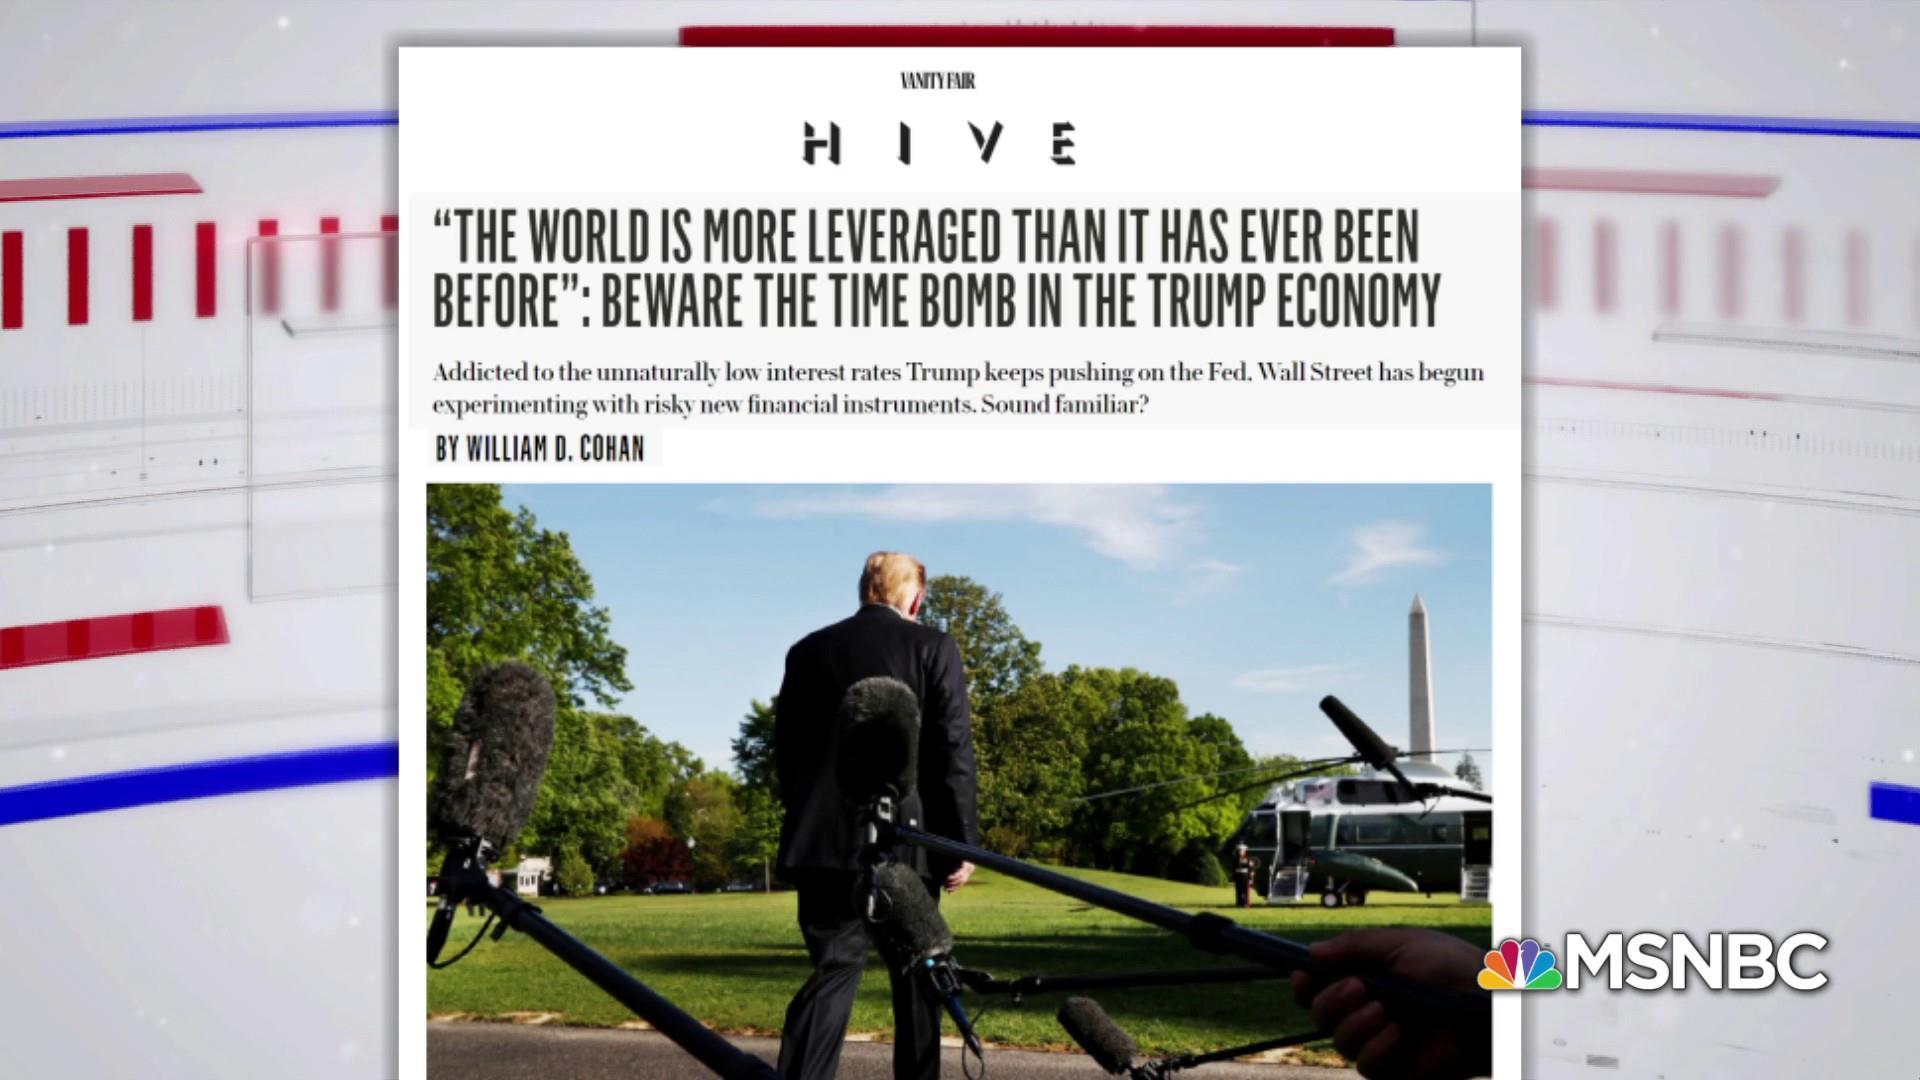 Vanity Fair: Beware the time bomb in the Trump economy